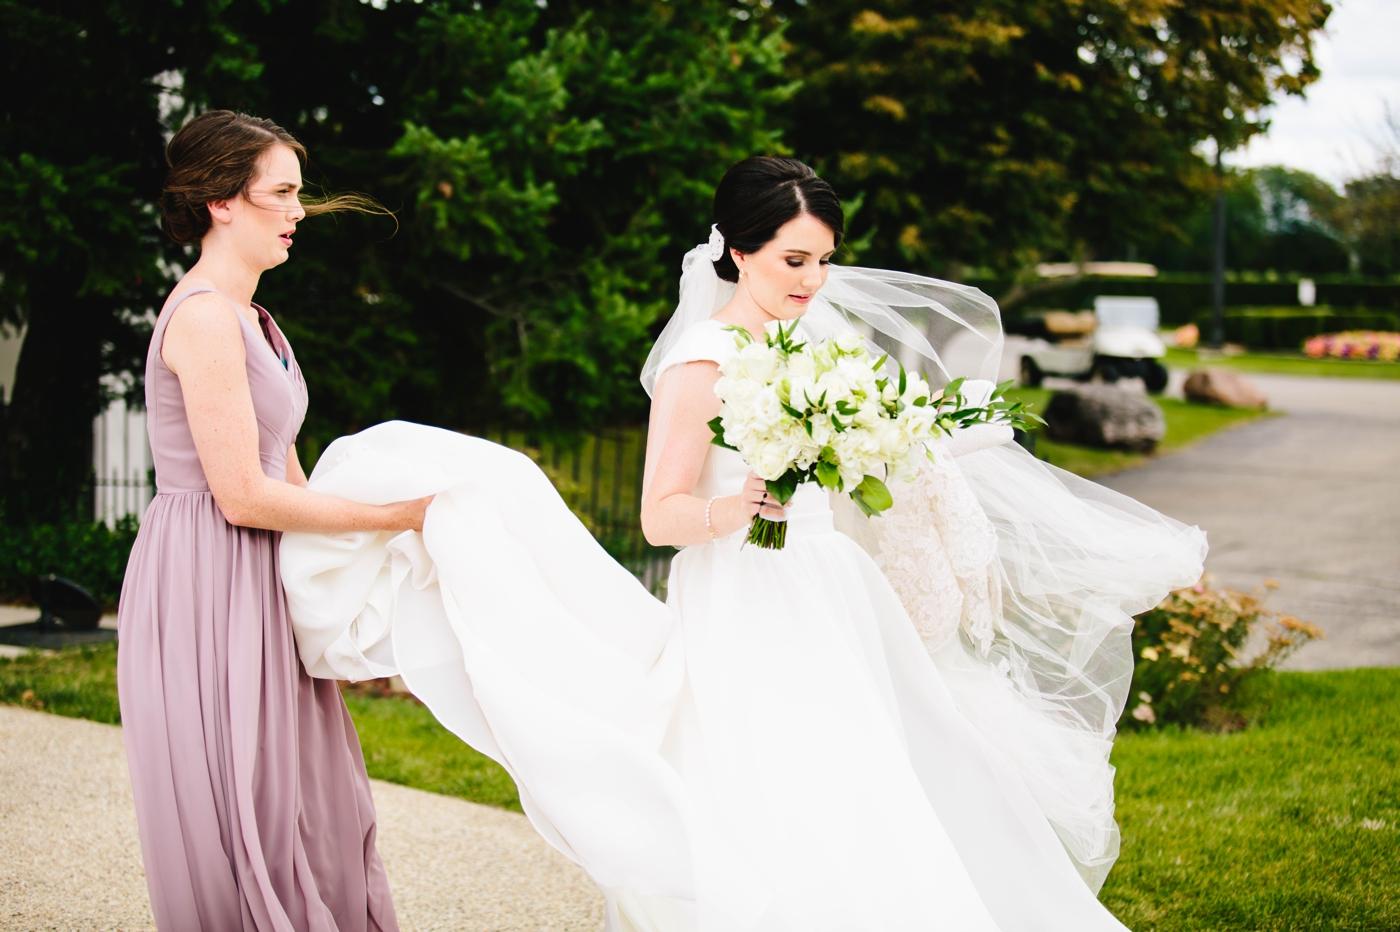 chicago-fine-art-wedding-photography-mccarthy20